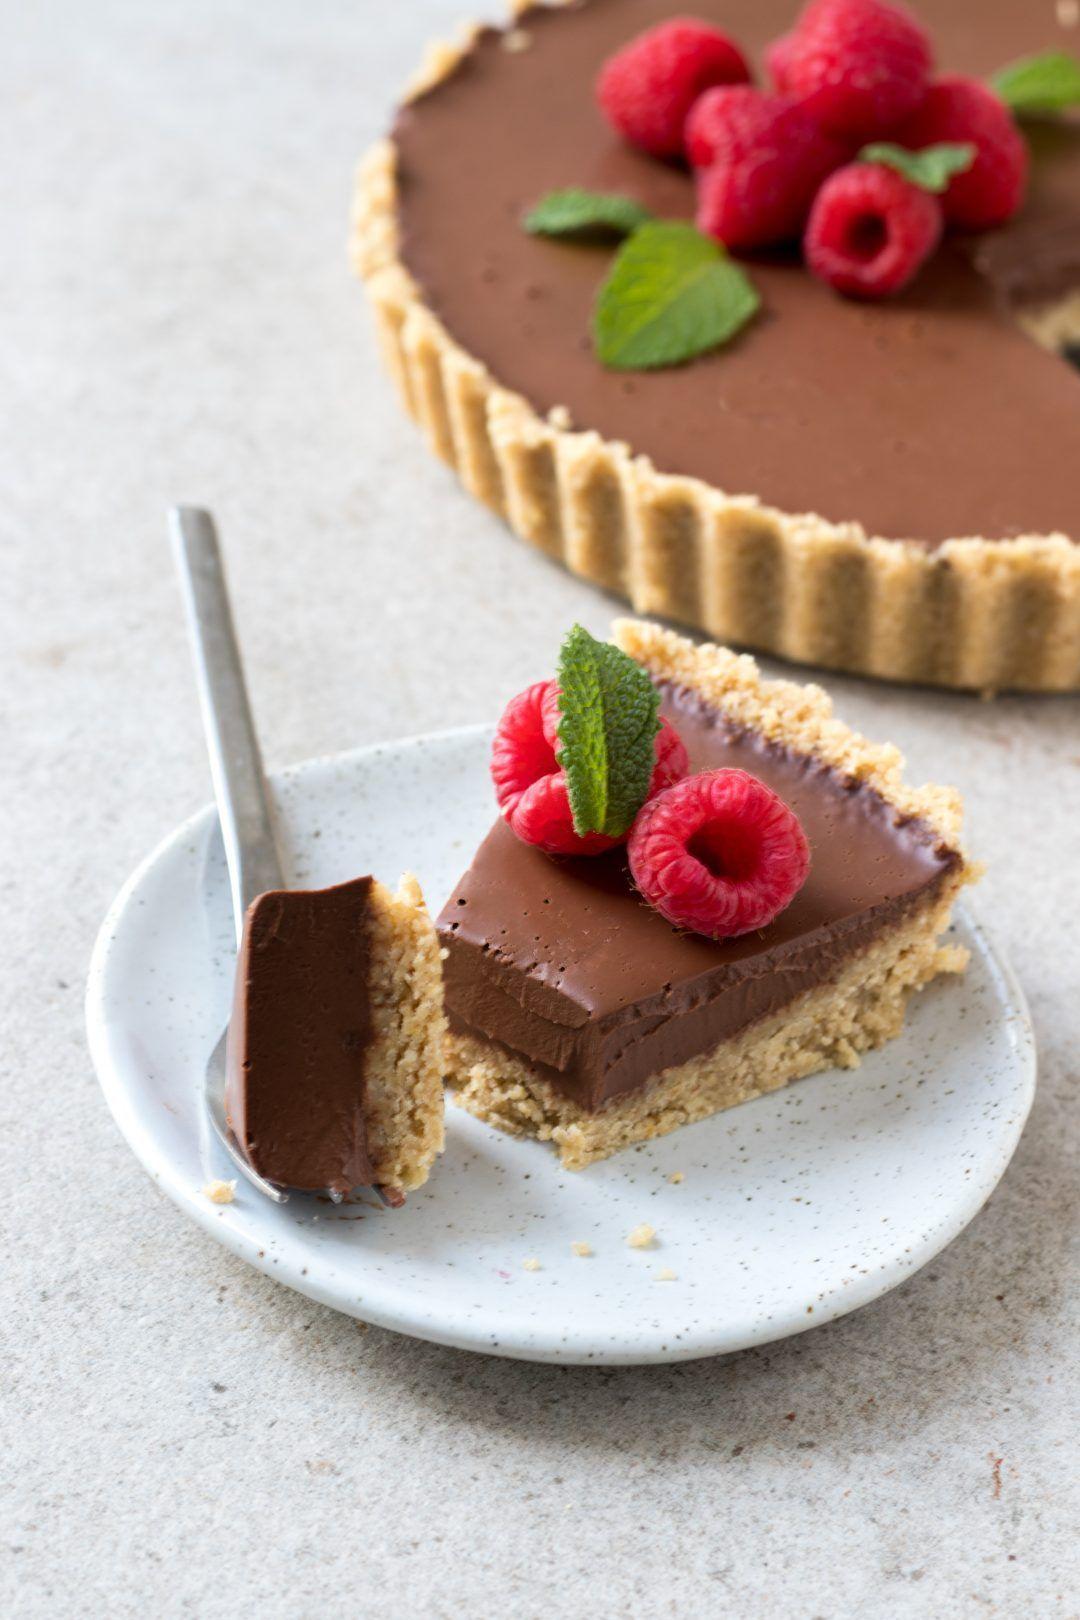 Healthy chocolate cake - Hands-free - Healthy recipes - Sustainable lifestyle -  healthy chocolate cake  - #Cake #Chocolate #deliciousdesserts #Handsfree #Healthy #Lifestyle #popularchristmasrecipes #Recipes #Sustainable #tumericrecipes